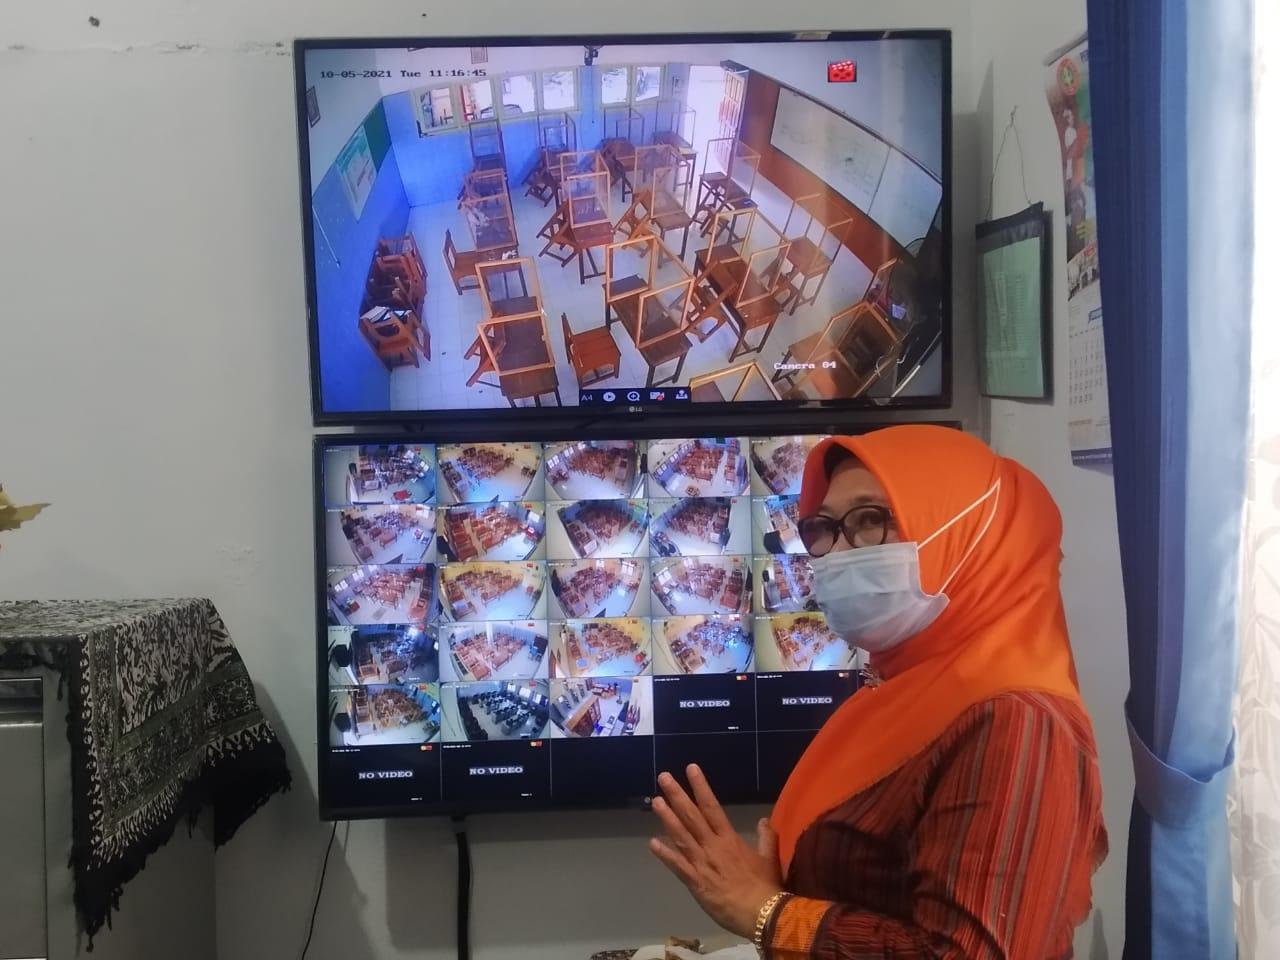 Kepala SMP Negeri Kota Semarang, Aminah Kurniasih, saat menjelaskan aturan PTM di sekolahnya, Selasa (5/10/2021). FOTO: Tito Isna Utama/Lingkar.co